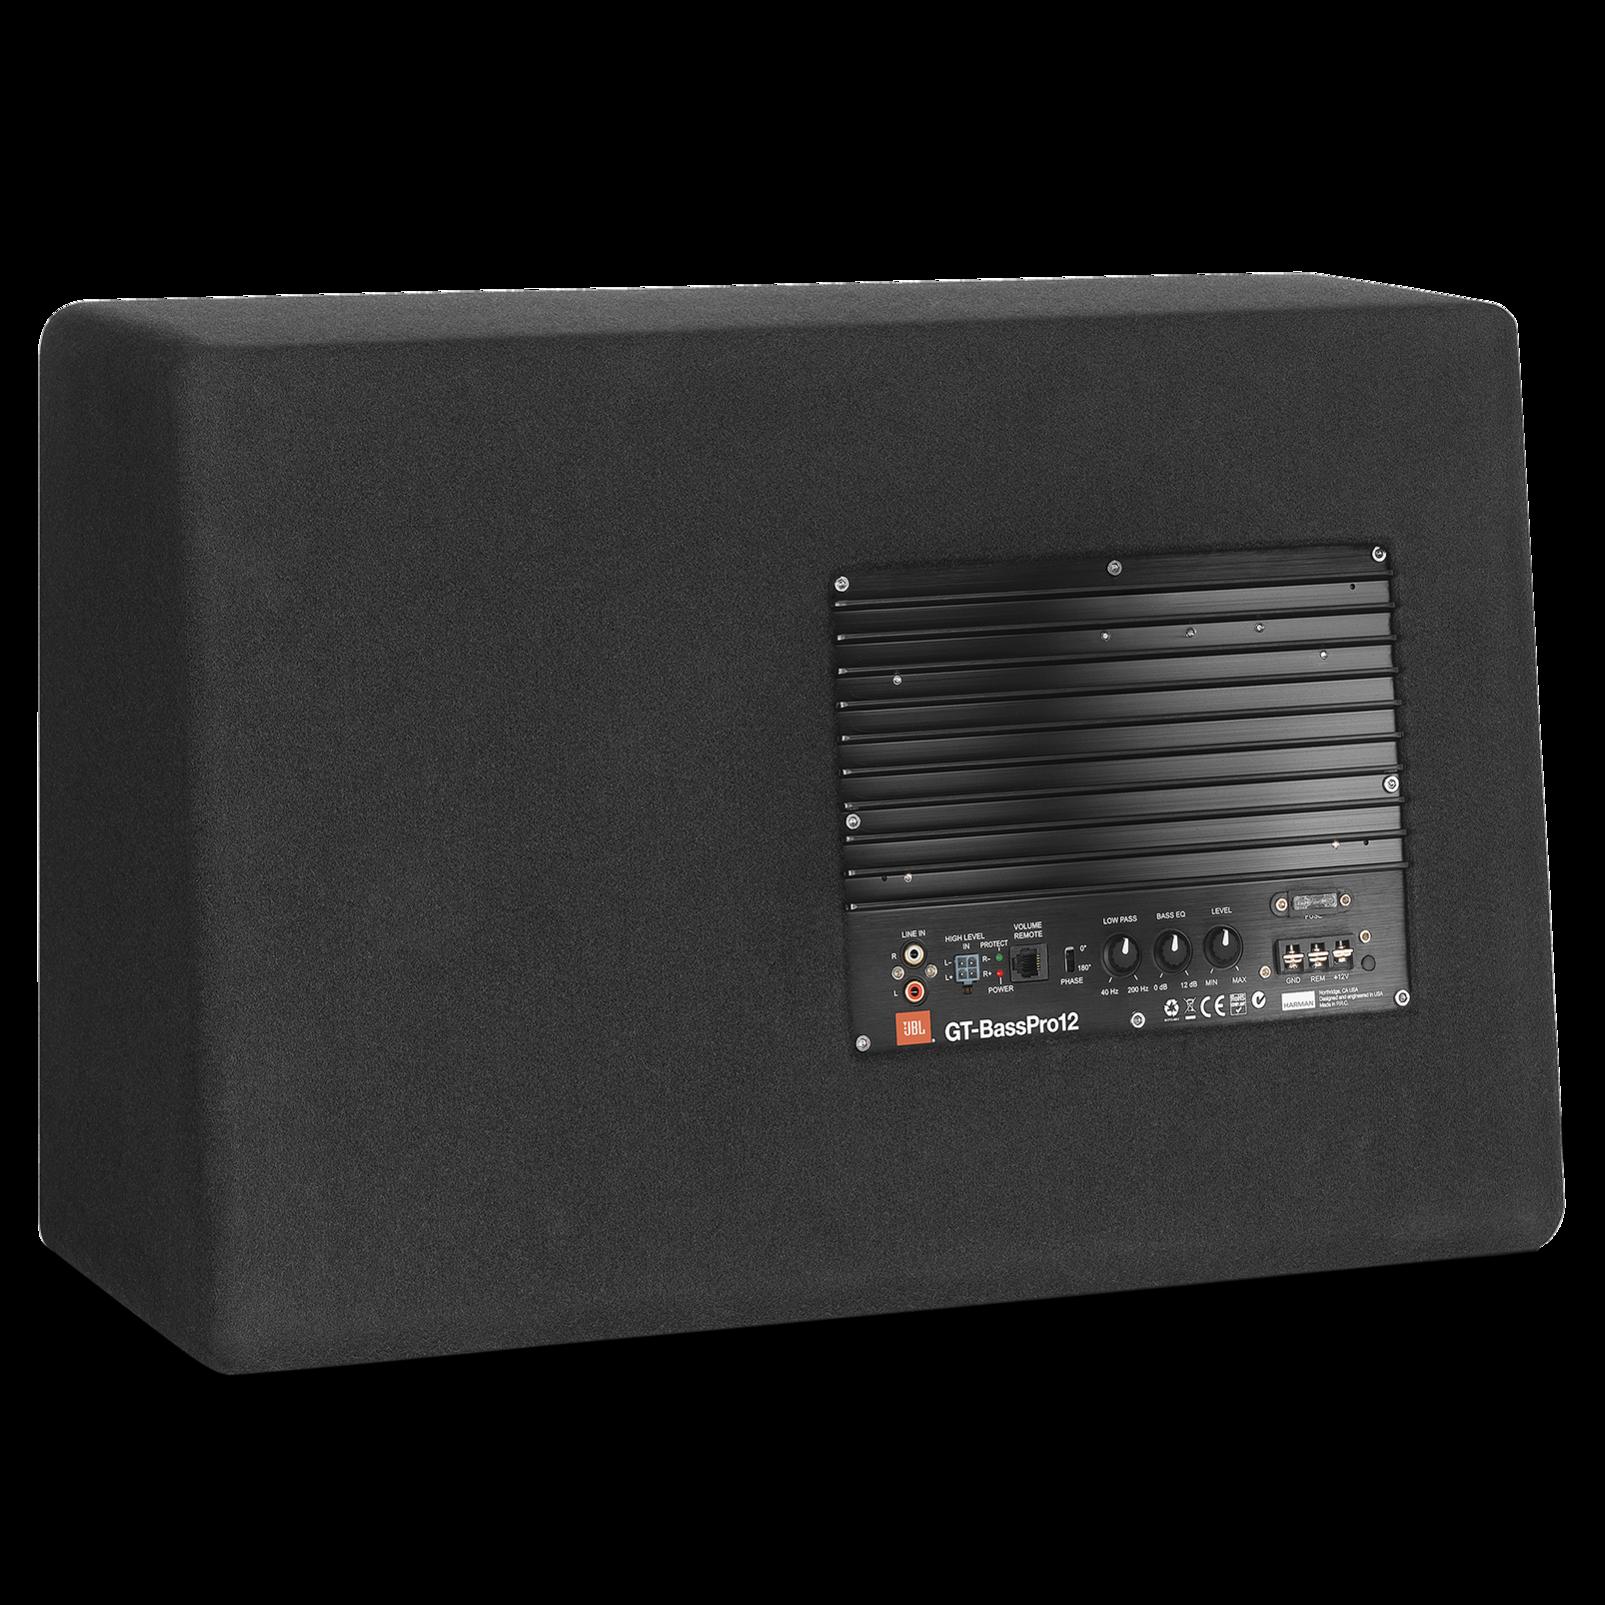 Wiring Diagram Jbl Bass Pro 12 - DATA Wiring Diagrams •